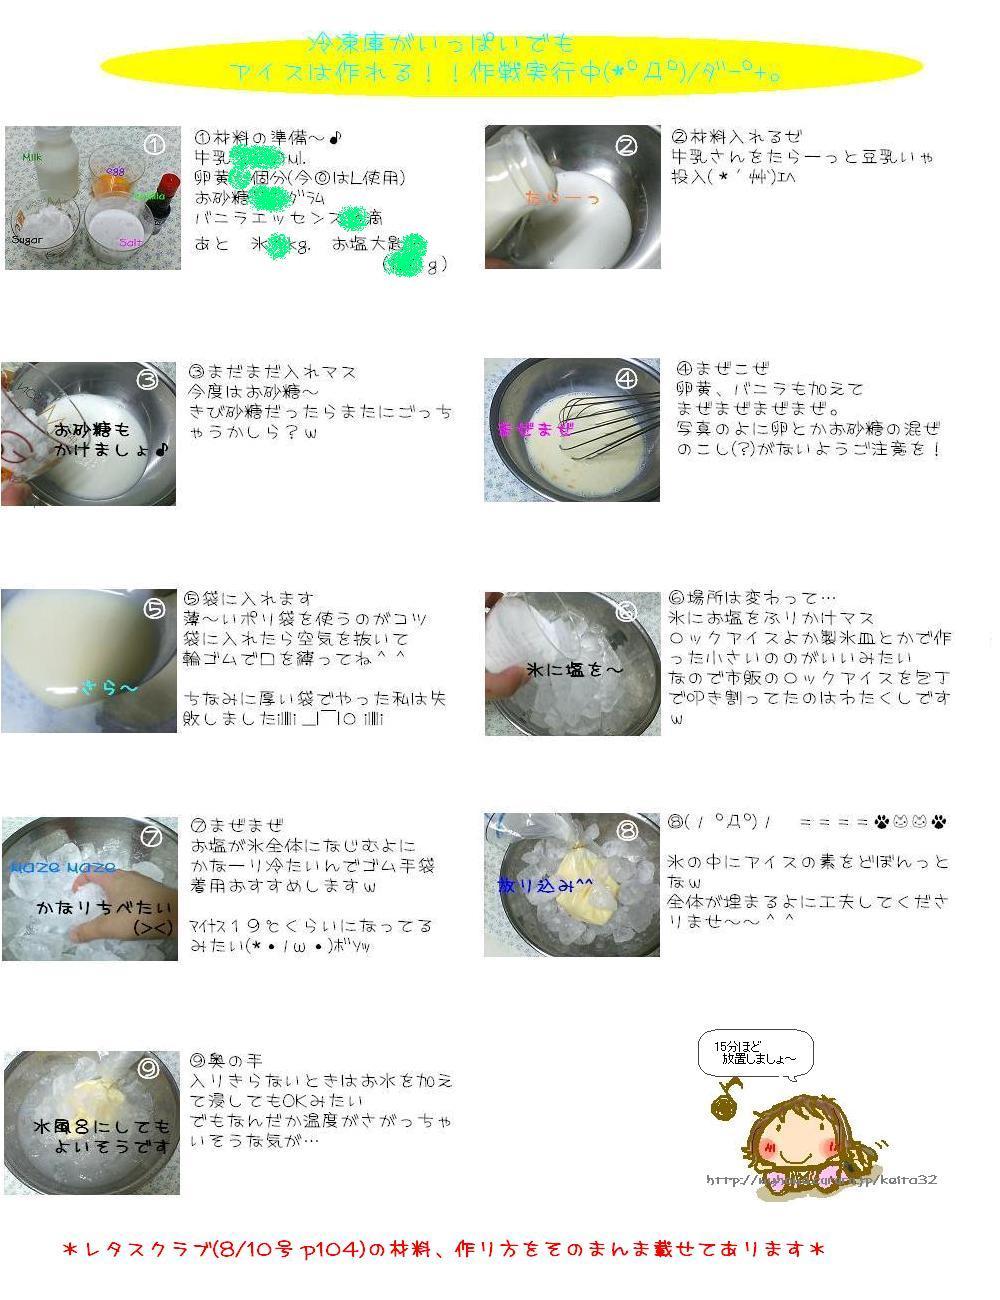 image2229429.jpg